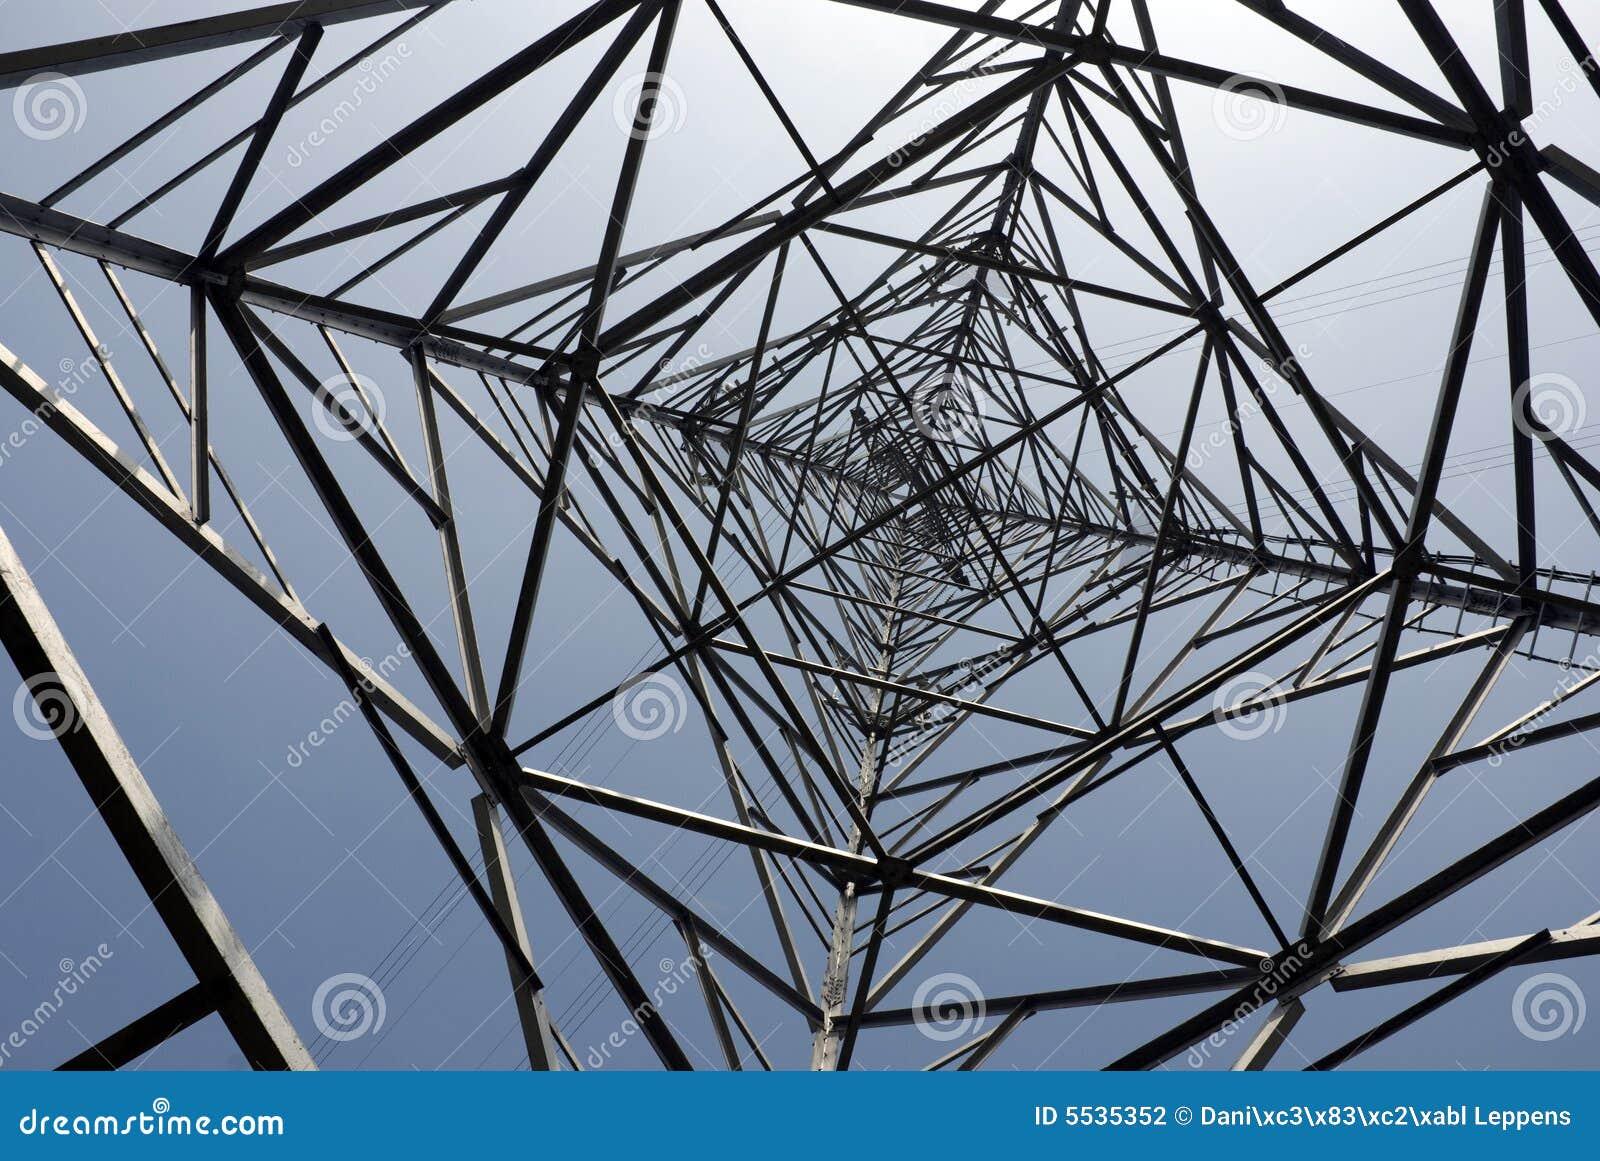 электрические опоры